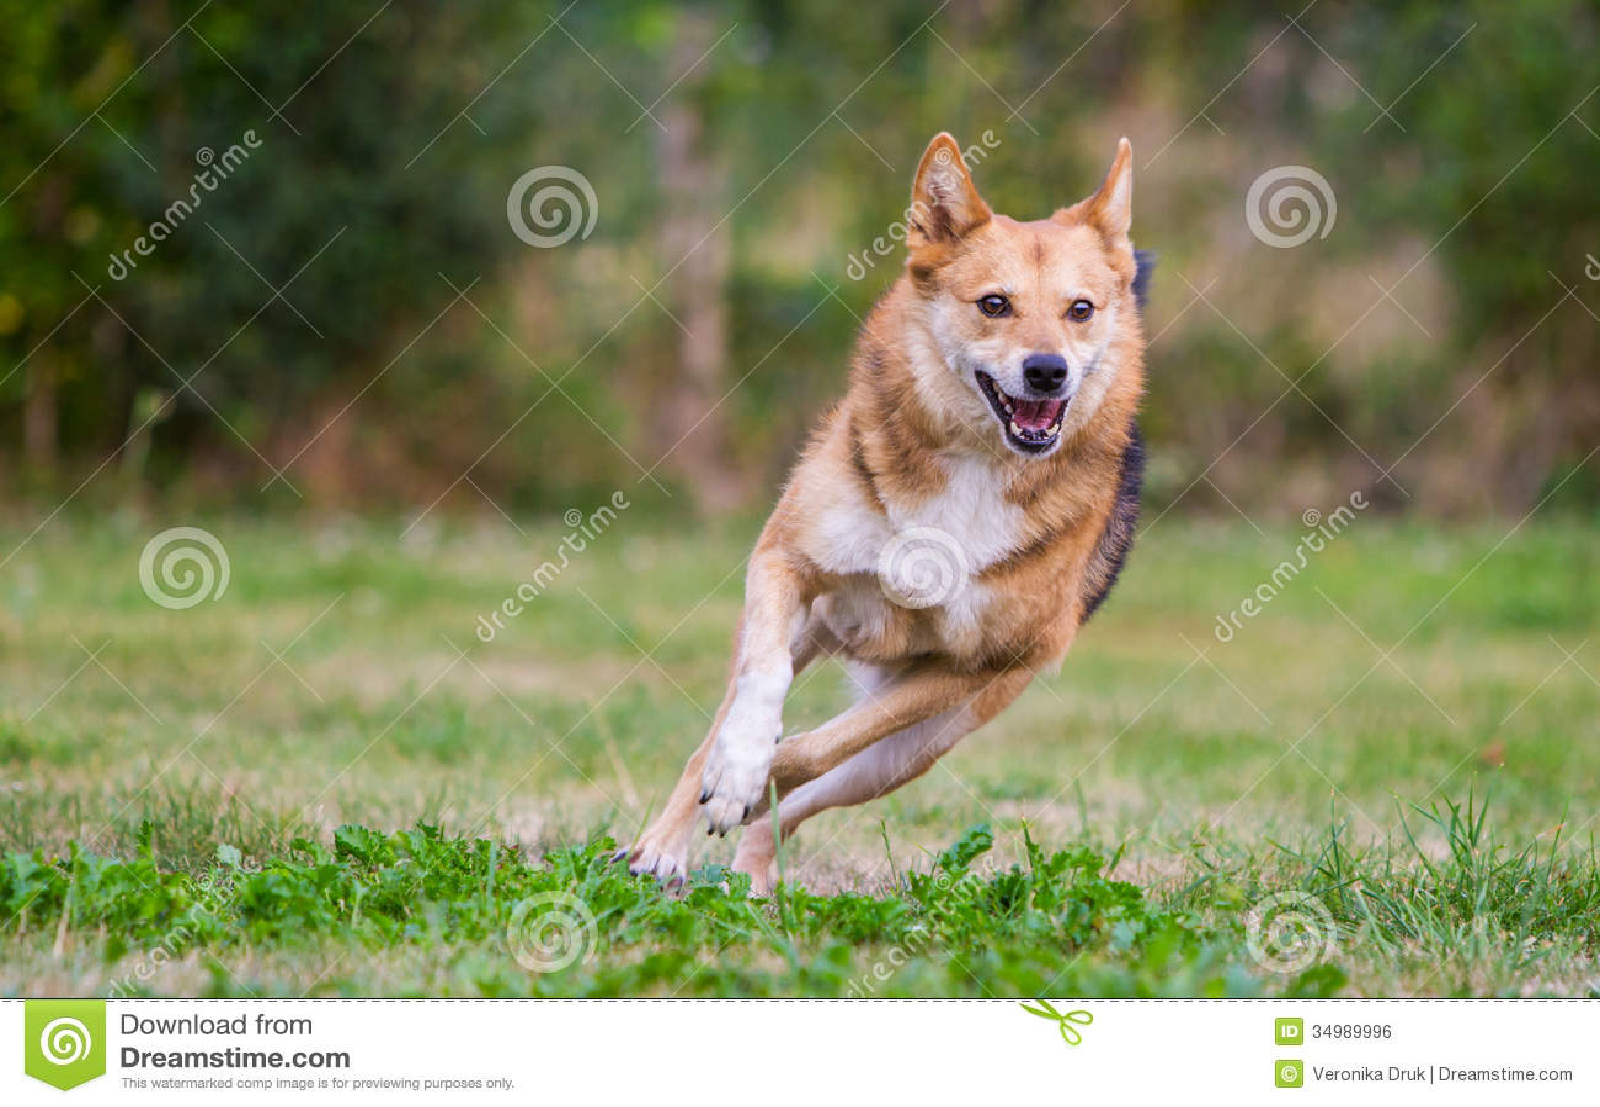 happy dog running on full speed stock photo image 34989996. Black Bedroom Furniture Sets. Home Design Ideas